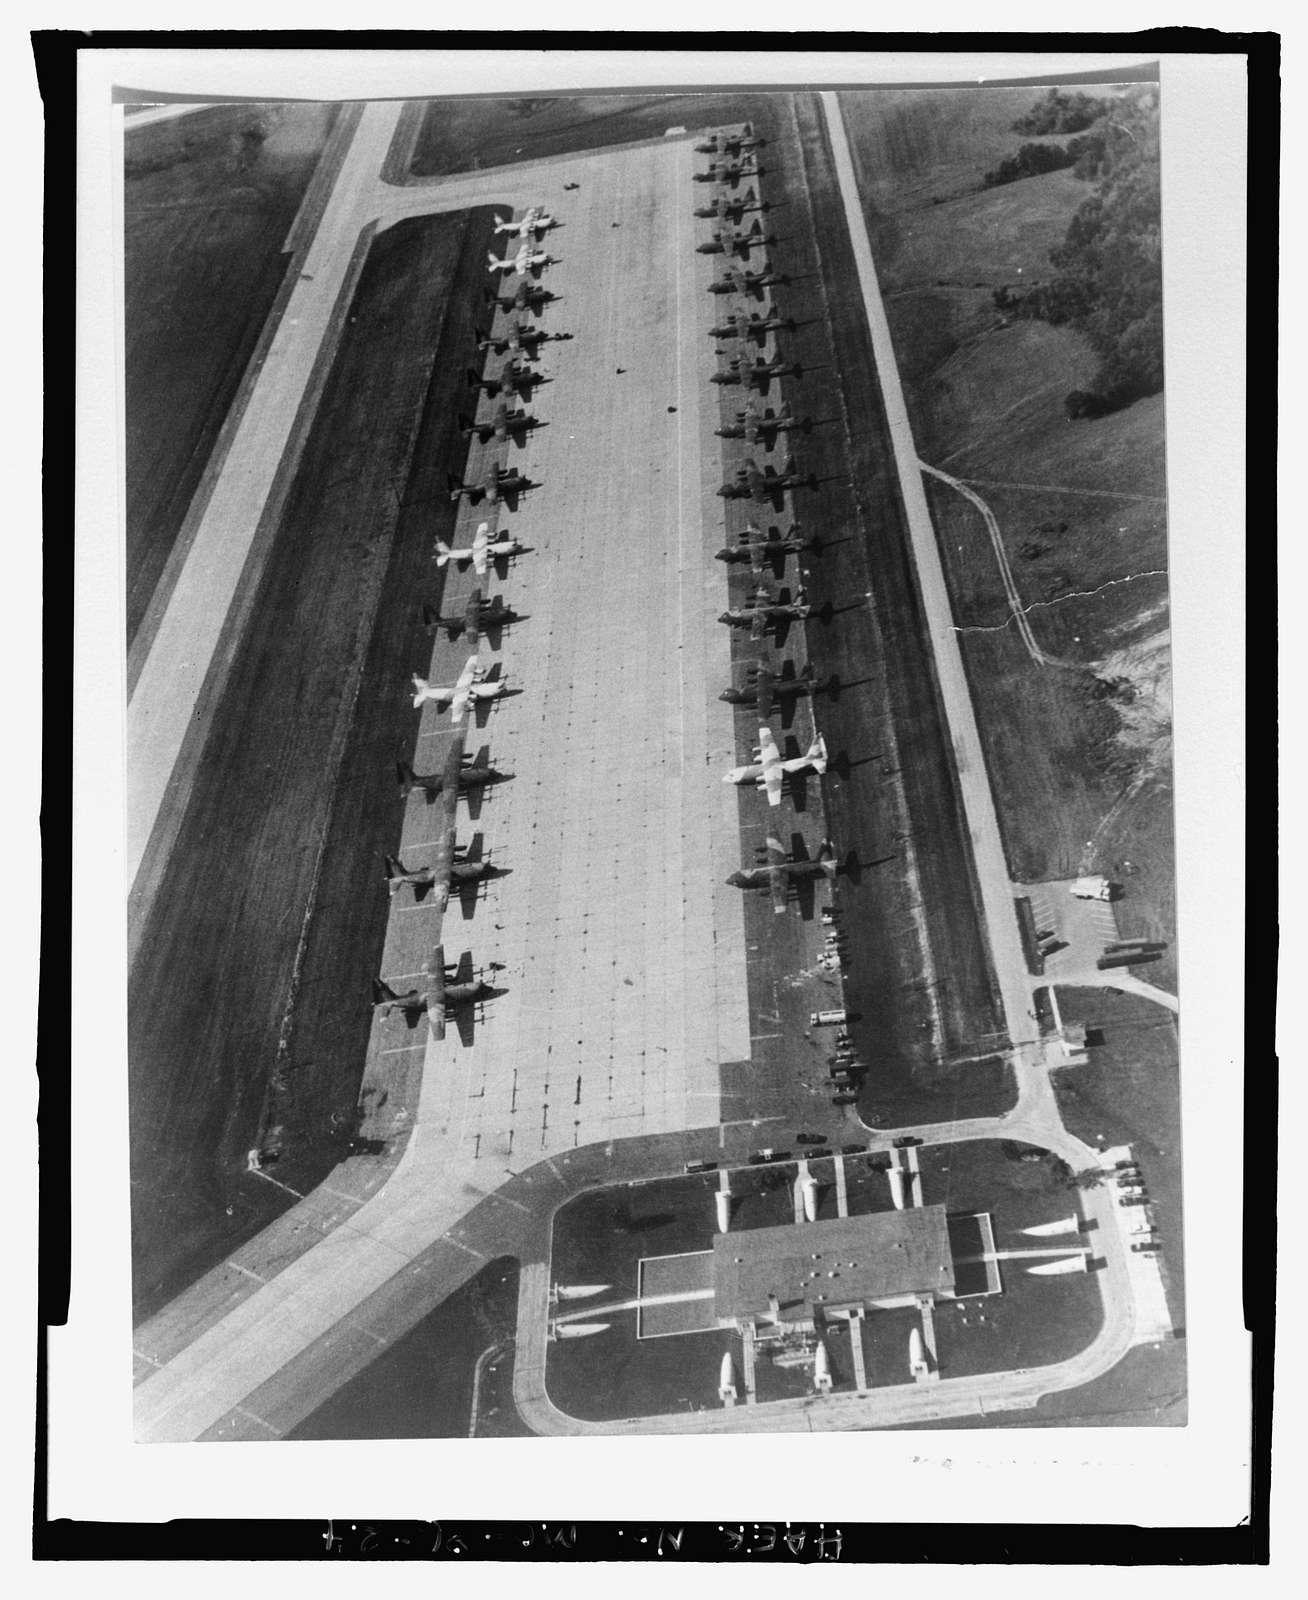 Whiteman Air Force Base, Bomber Alert Facility S-6, 1300 Alert Road, Knob Noster, Johnson County, MO